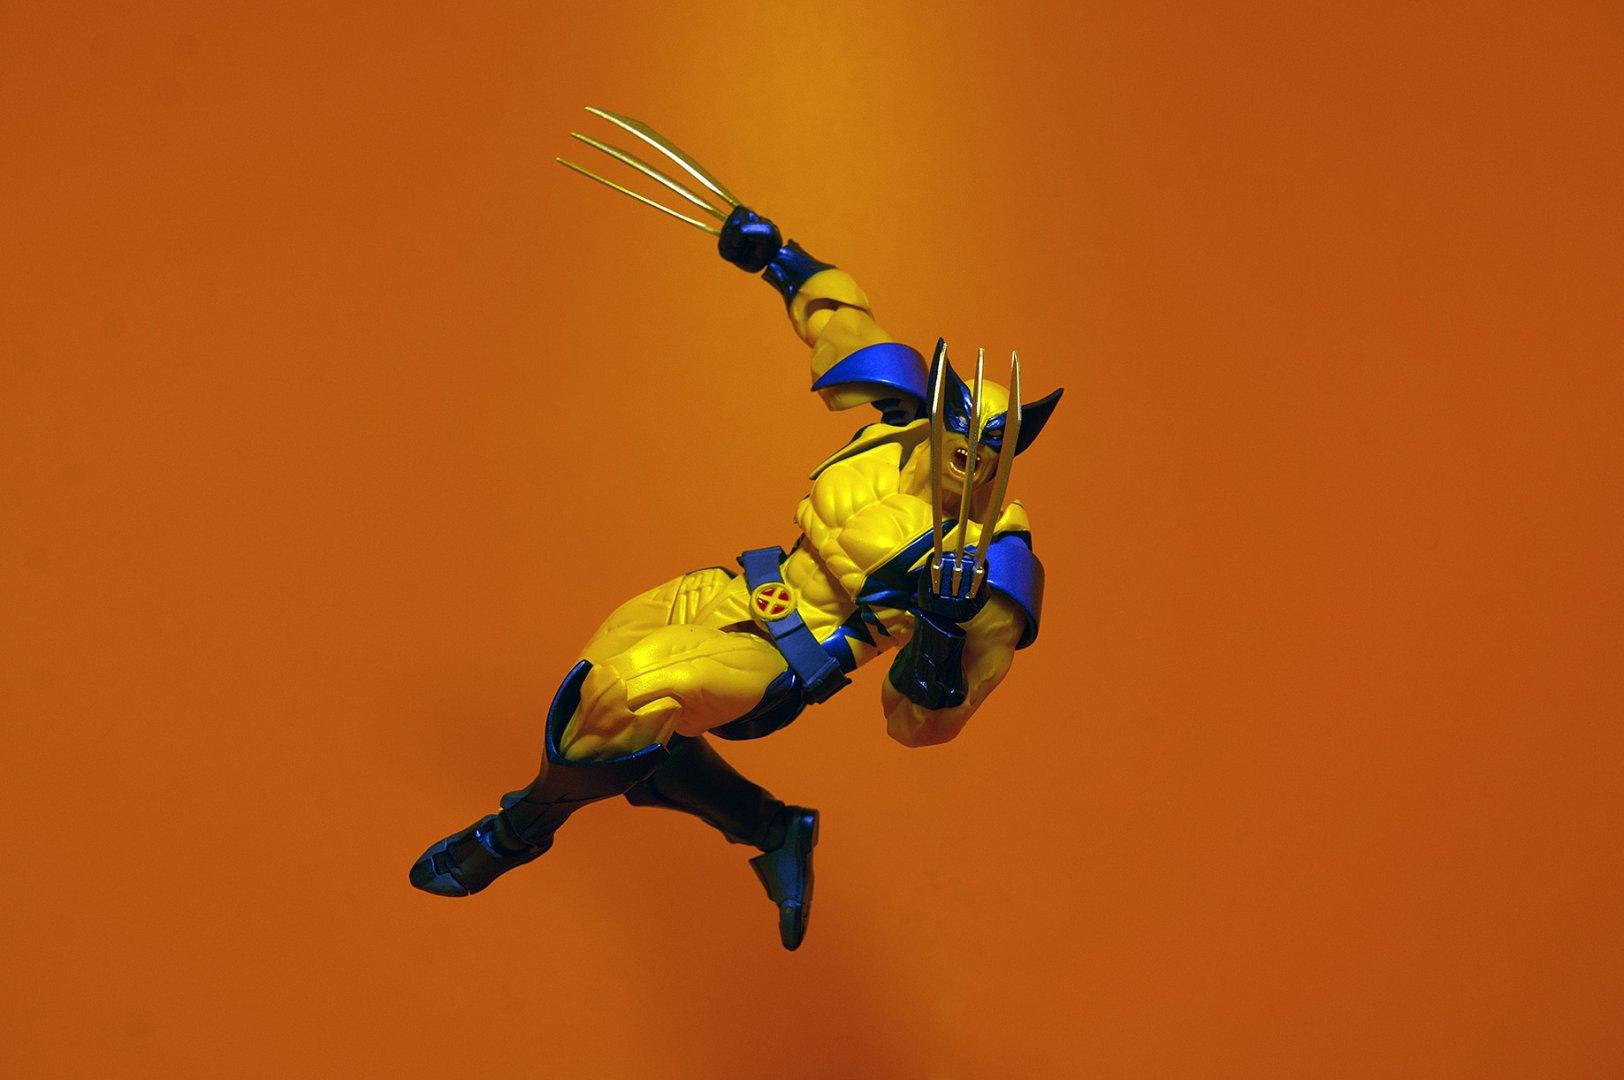 Marvel_Revo_Wolverine__Sm_DSC06153.thumb.jpg.a894915e5193a12548f7f66dad3a757d.jpg